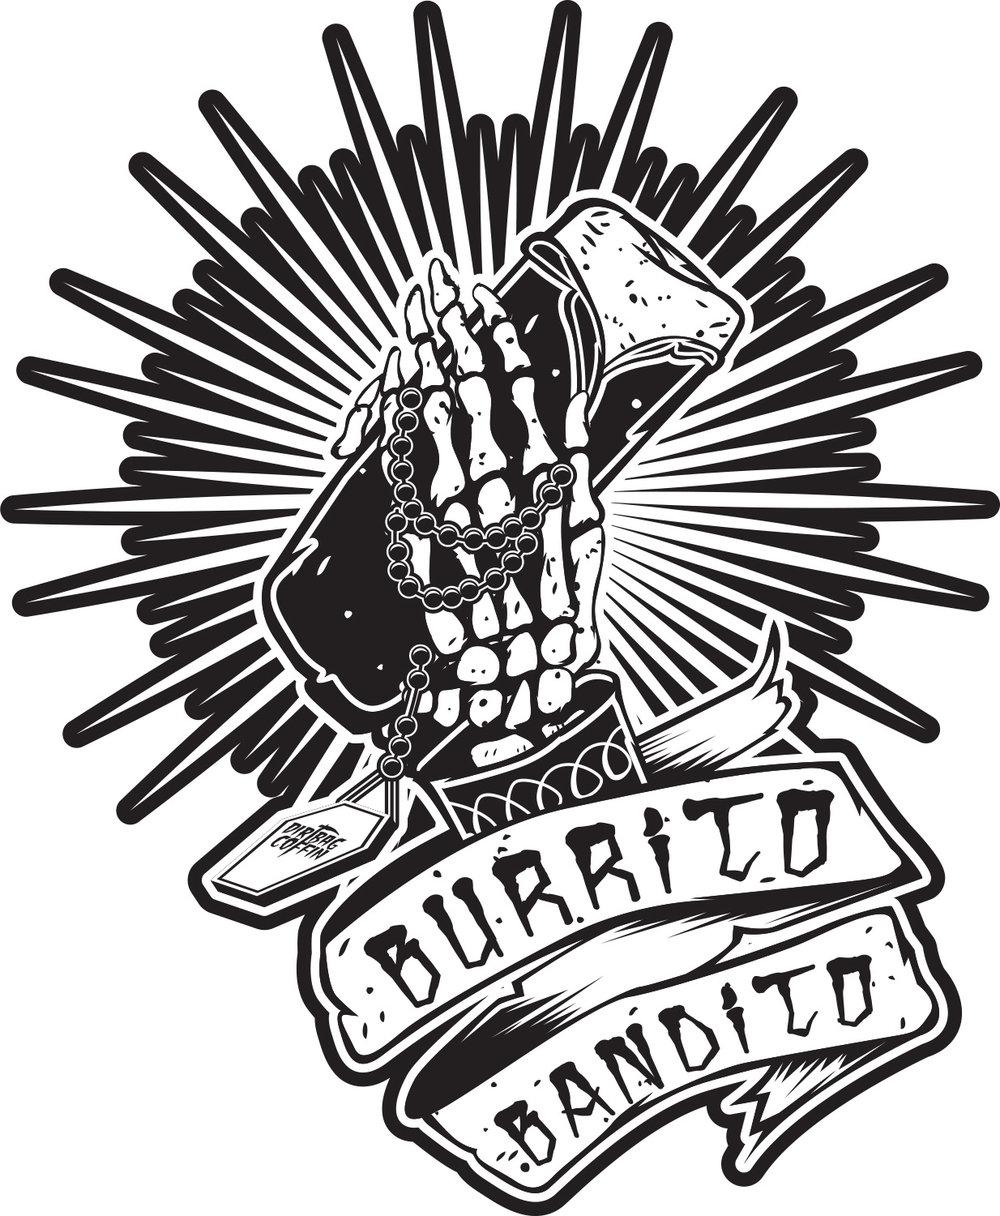 Burrito Bandito_Pray Hands_5x5.jpg